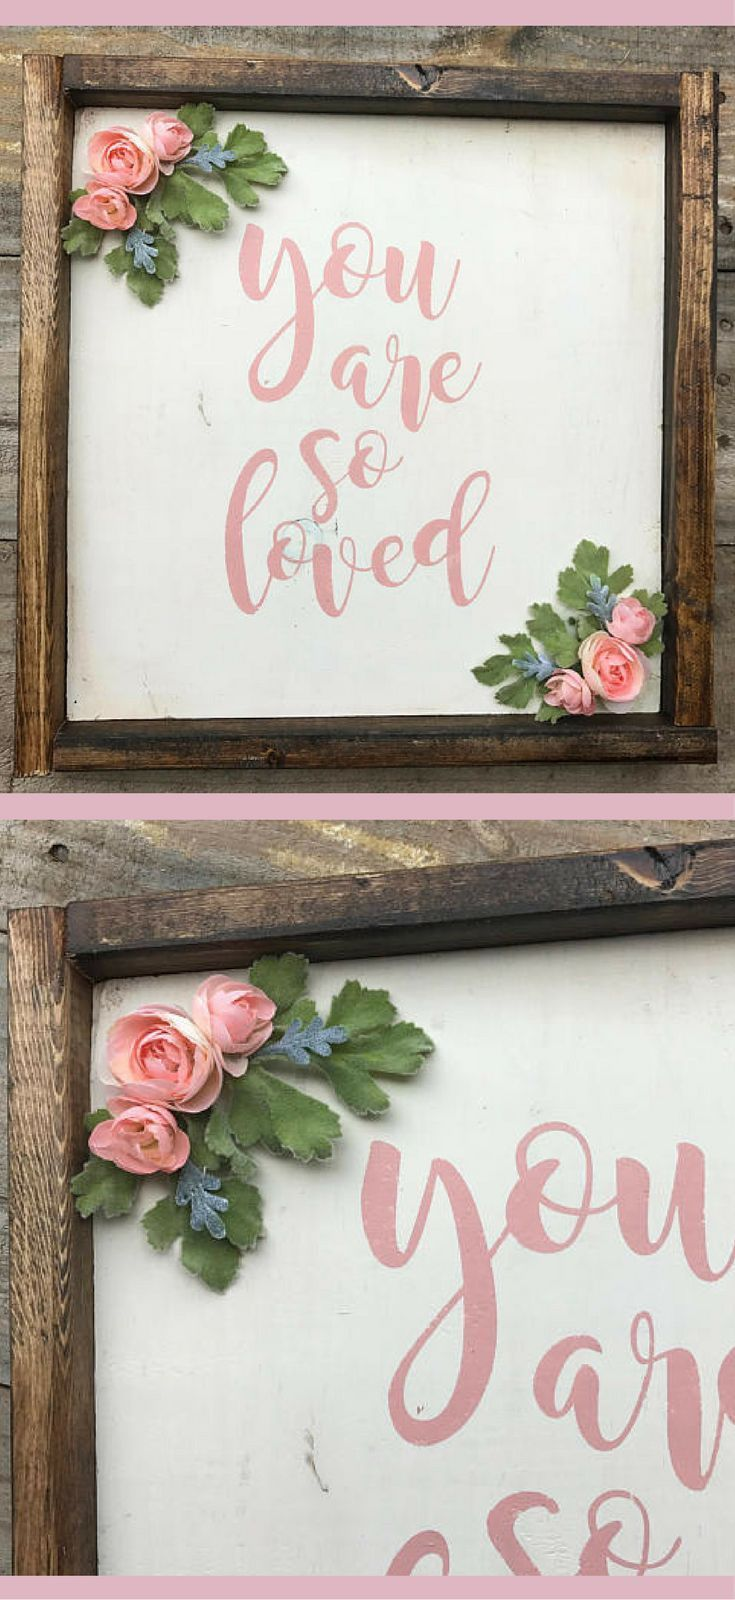 "Sweet little nursery wall art! Floral flower Nursery ""you are so loved"", rustic nursery decor, rustic frame reclaimed pallet wood sign, floral nursery sign little girl room, boho baby girl nursery #affiliate #rusticnursery #bohobaby"